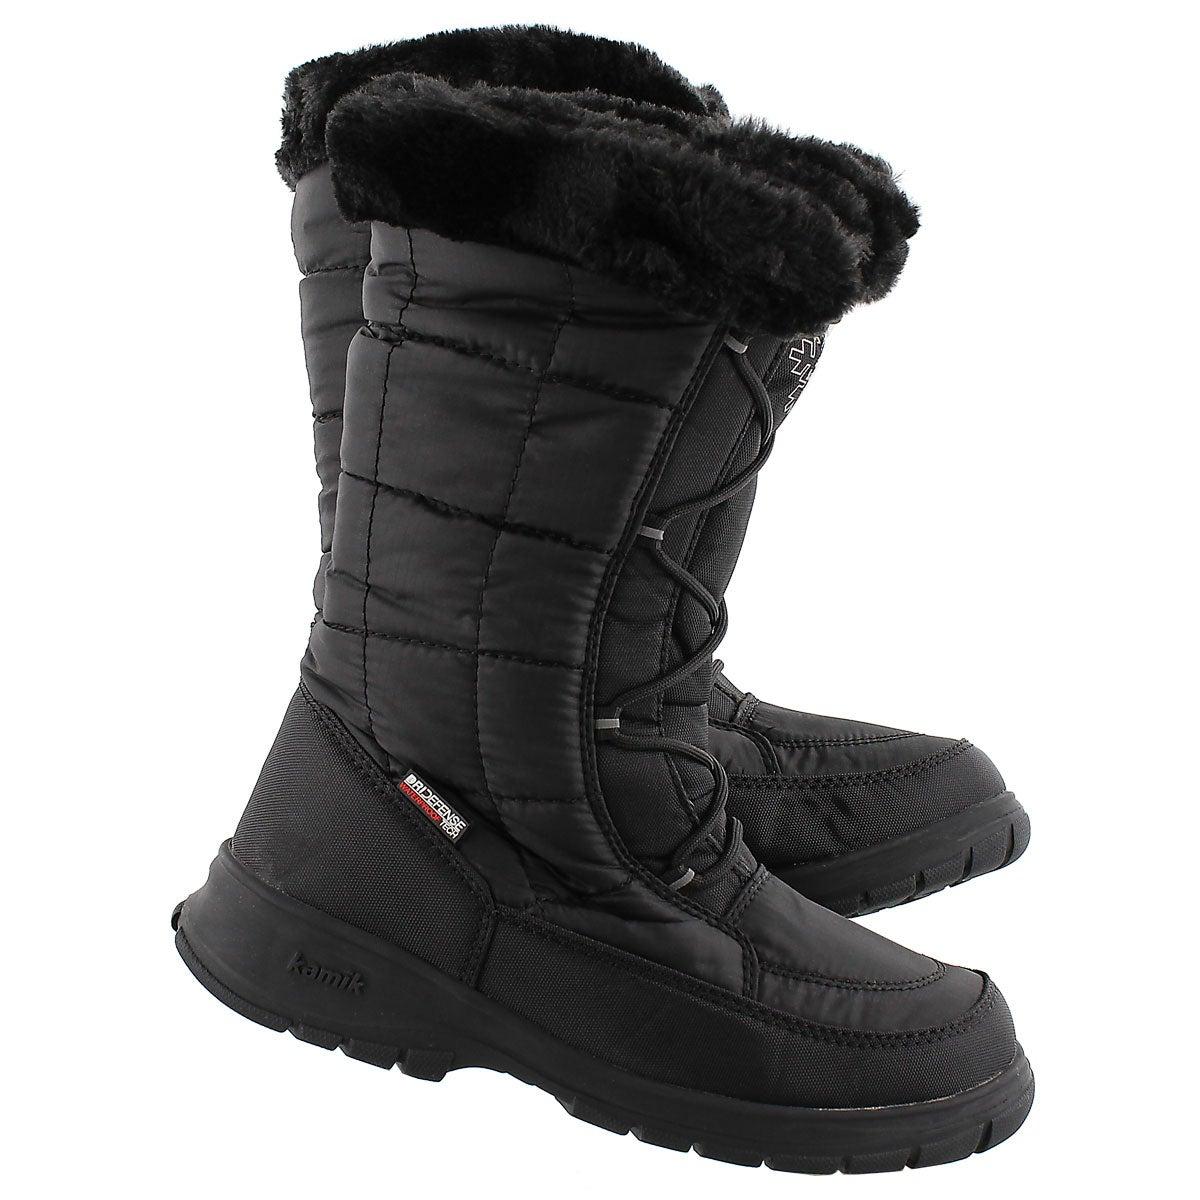 Womens Snow Boots Size 9 Wide | Homewood Mountain Ski Resort